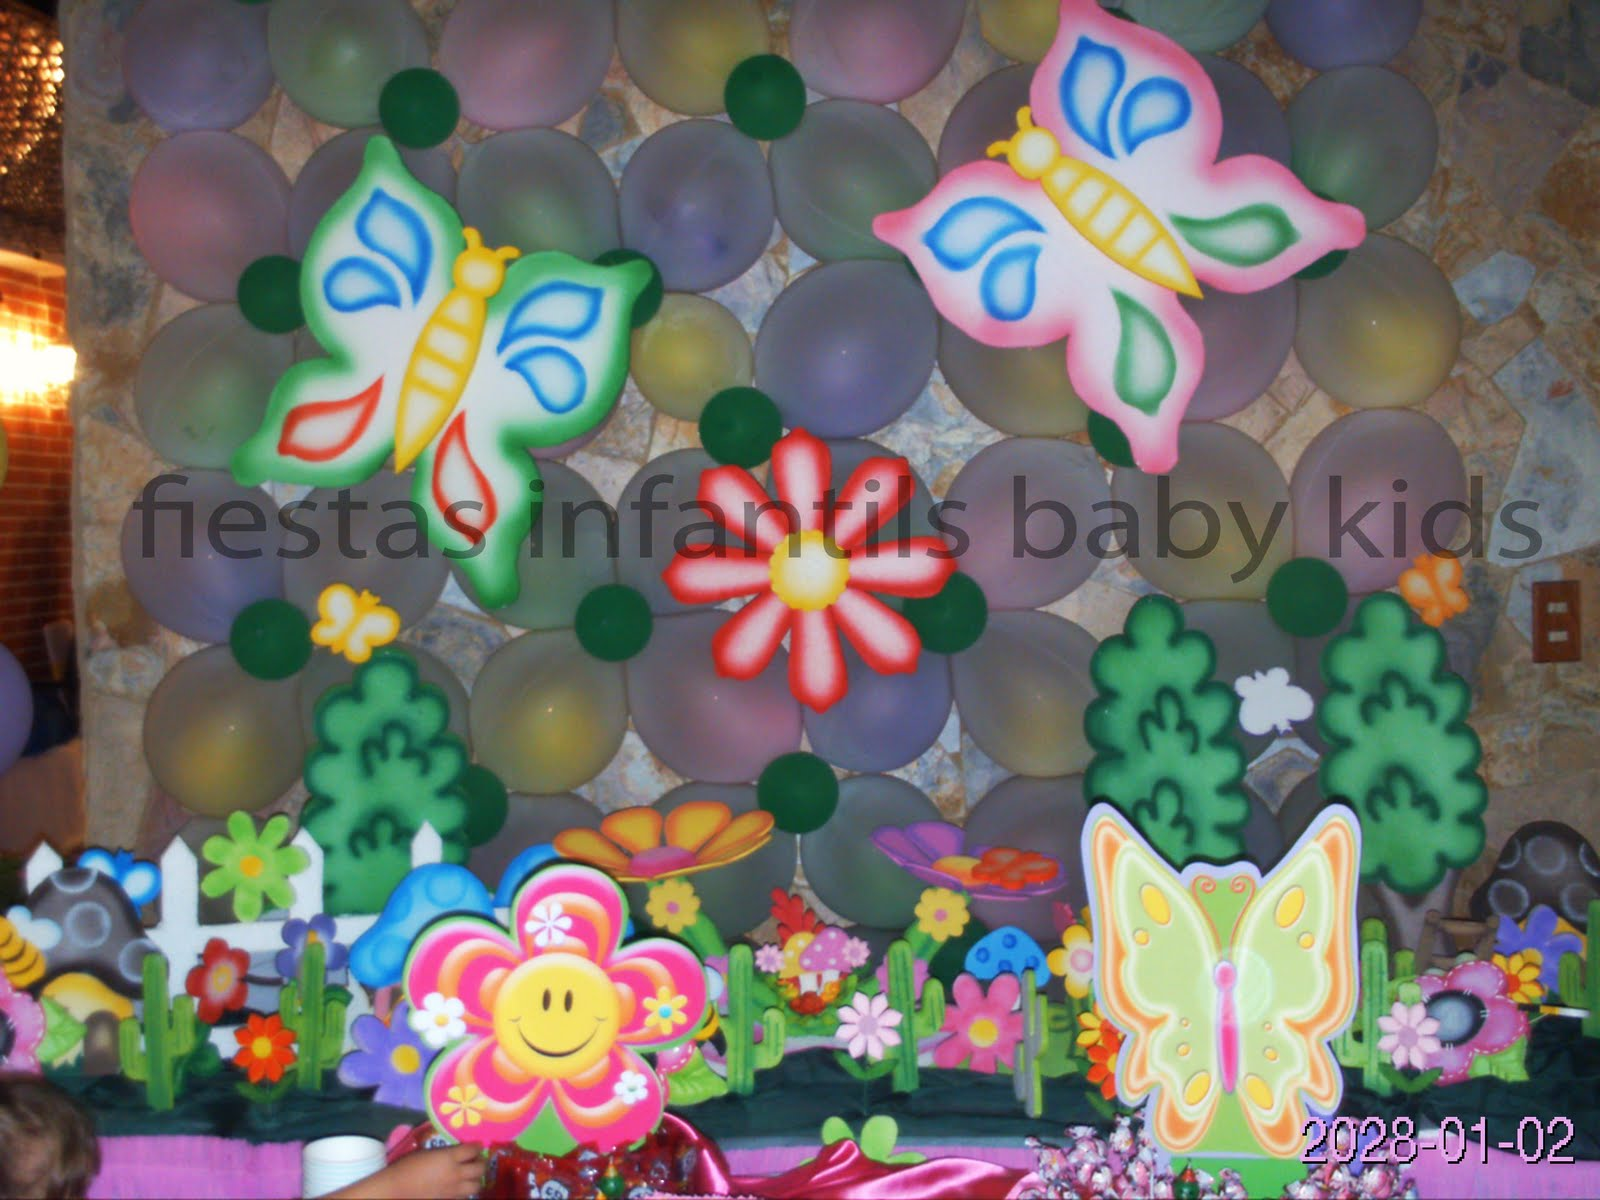 Fiestas infantiles mariposas imagui - Mariposas decoracion pared ...